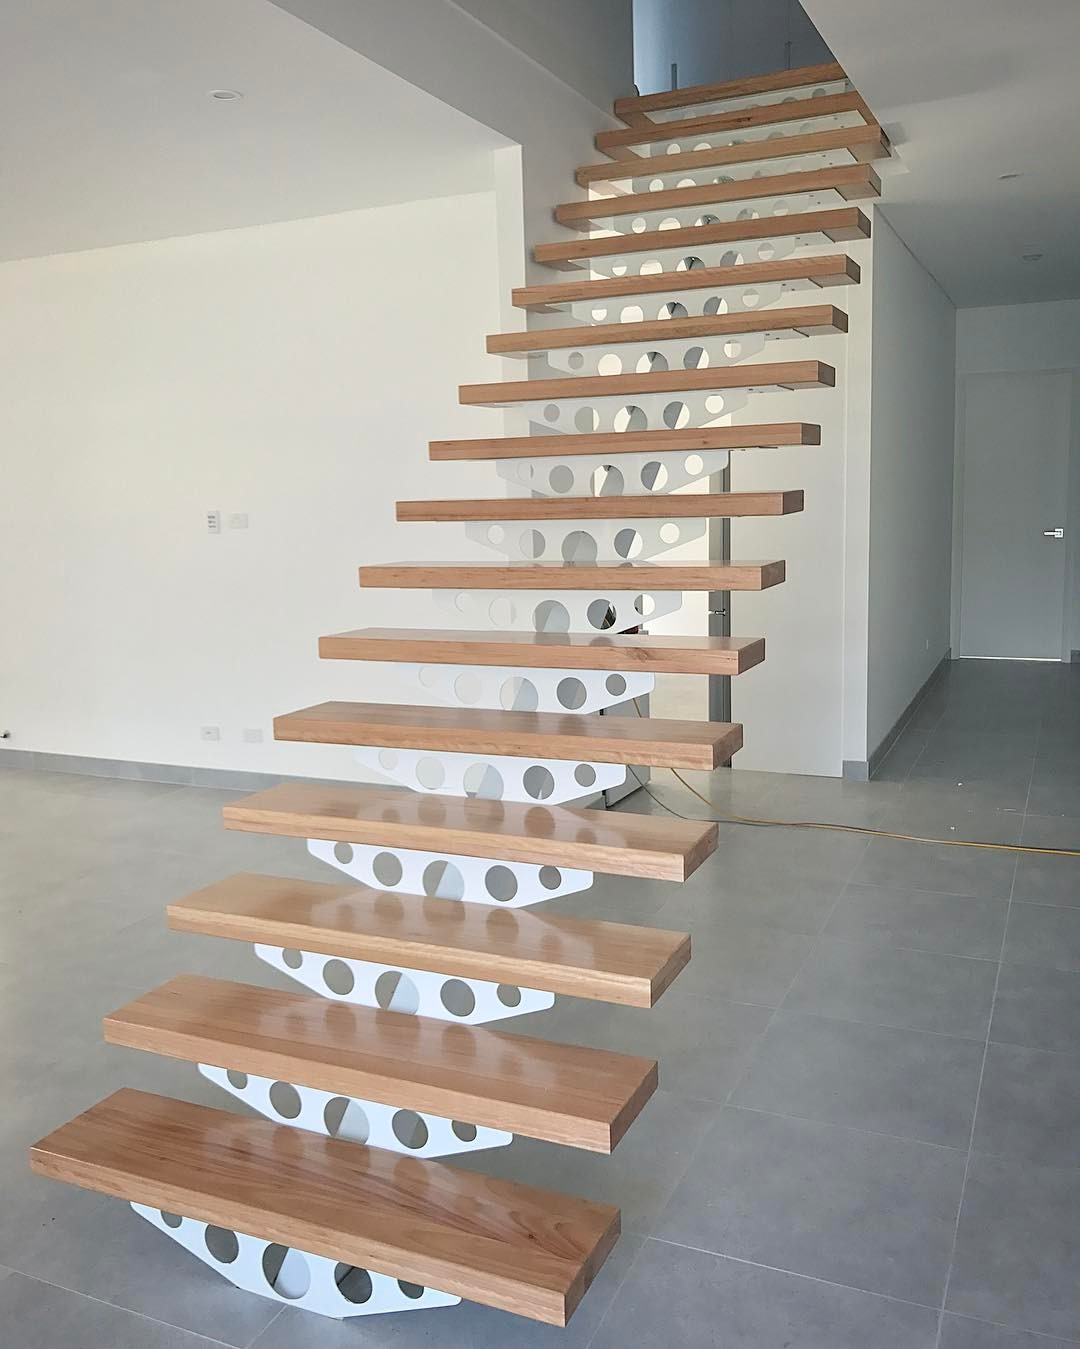 Timber Floors Pty Ltd solid Blackbutt hardwood step treads 65mm thick installed on steel plate monostring staircase by Timber Floors Pty Ltd